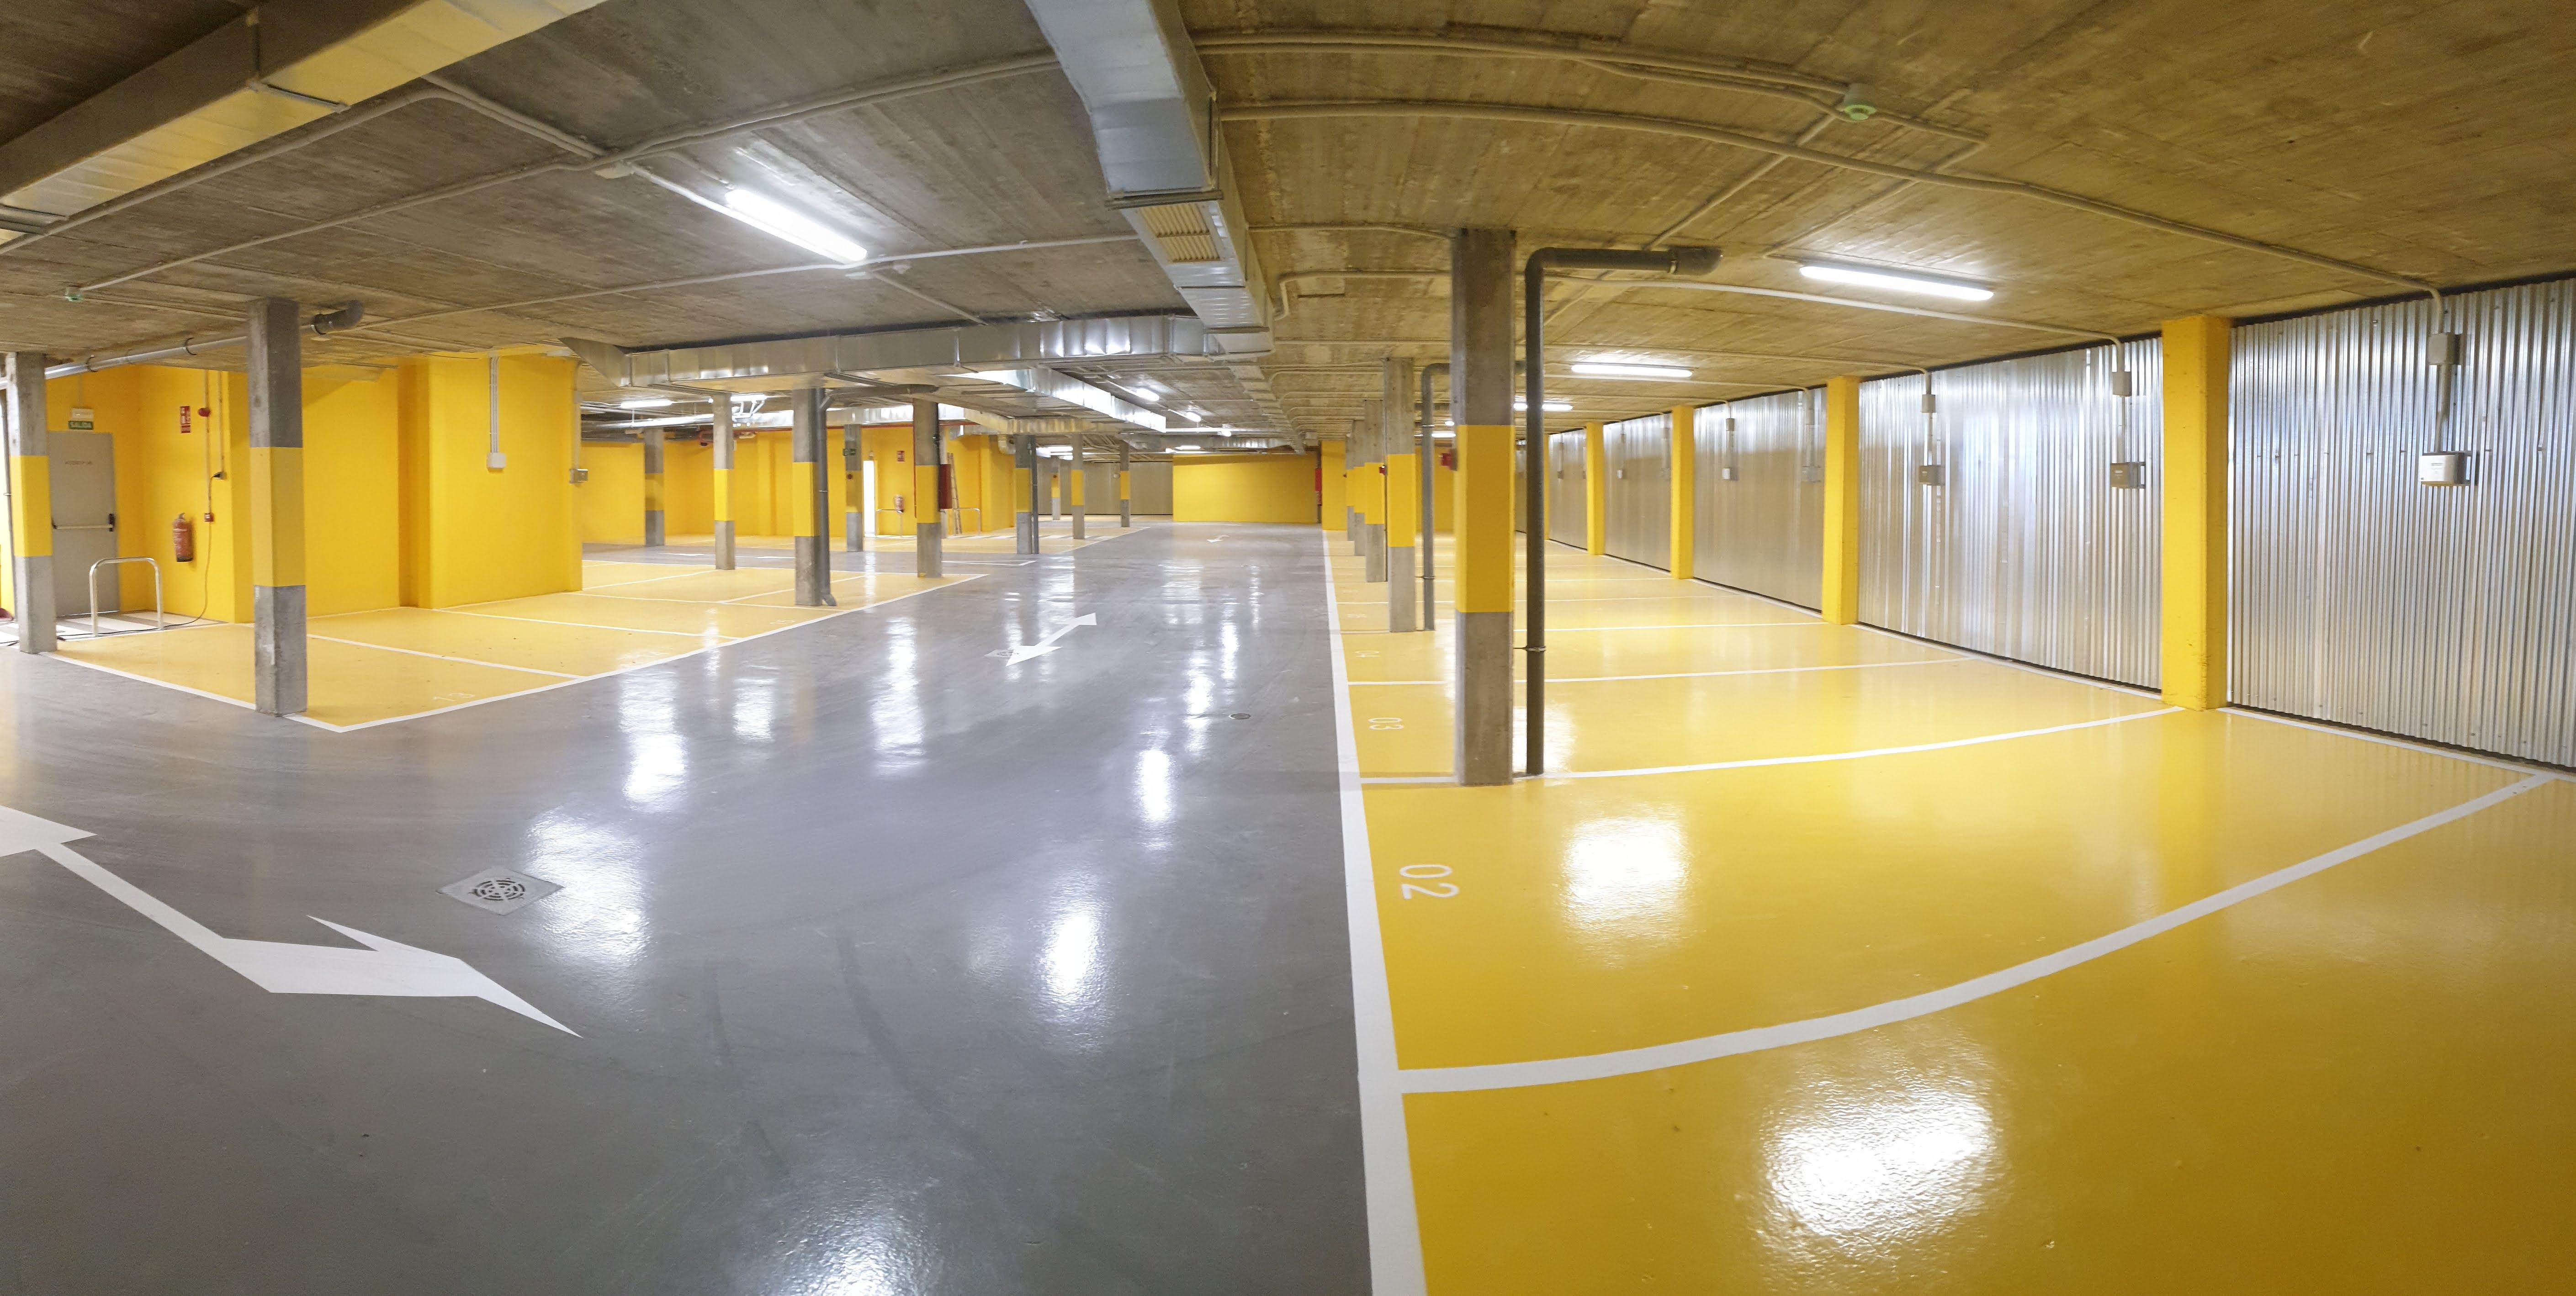 Planta sótano / DMDV Arquitectos/Landevel ArroyoFresno